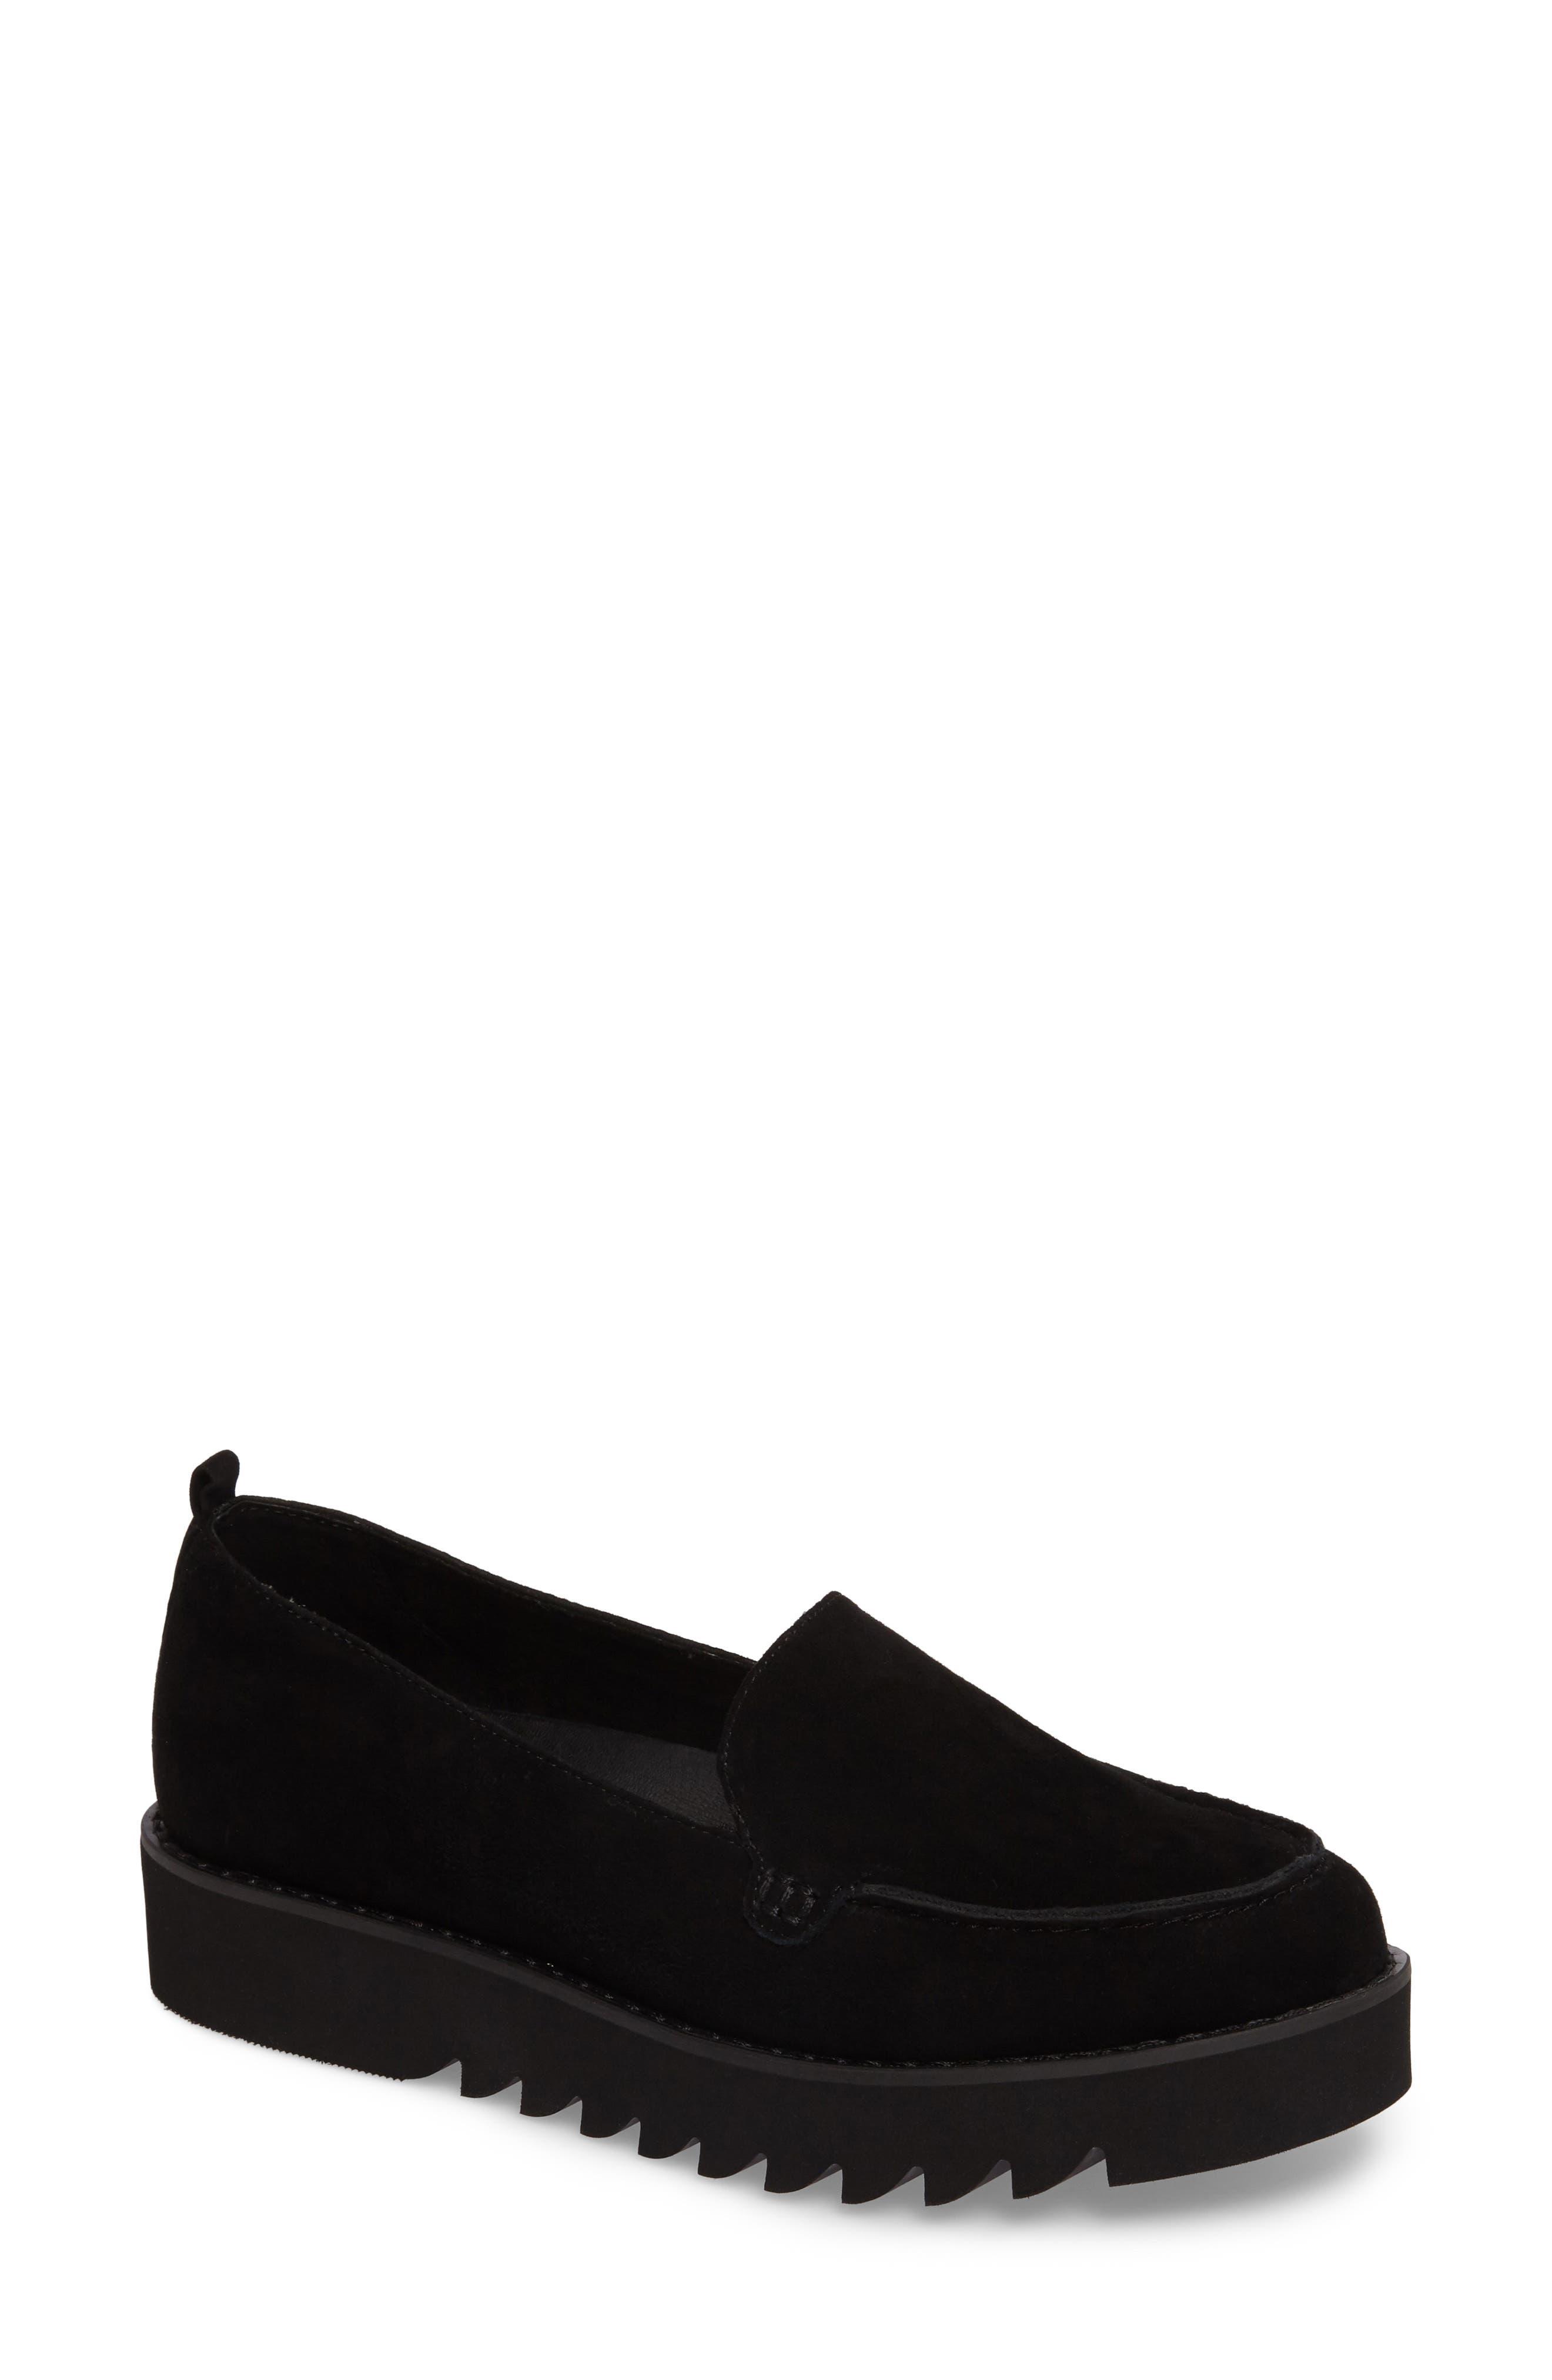 Kendall Loafer,                         Main,                         color, BLACK SUEDE